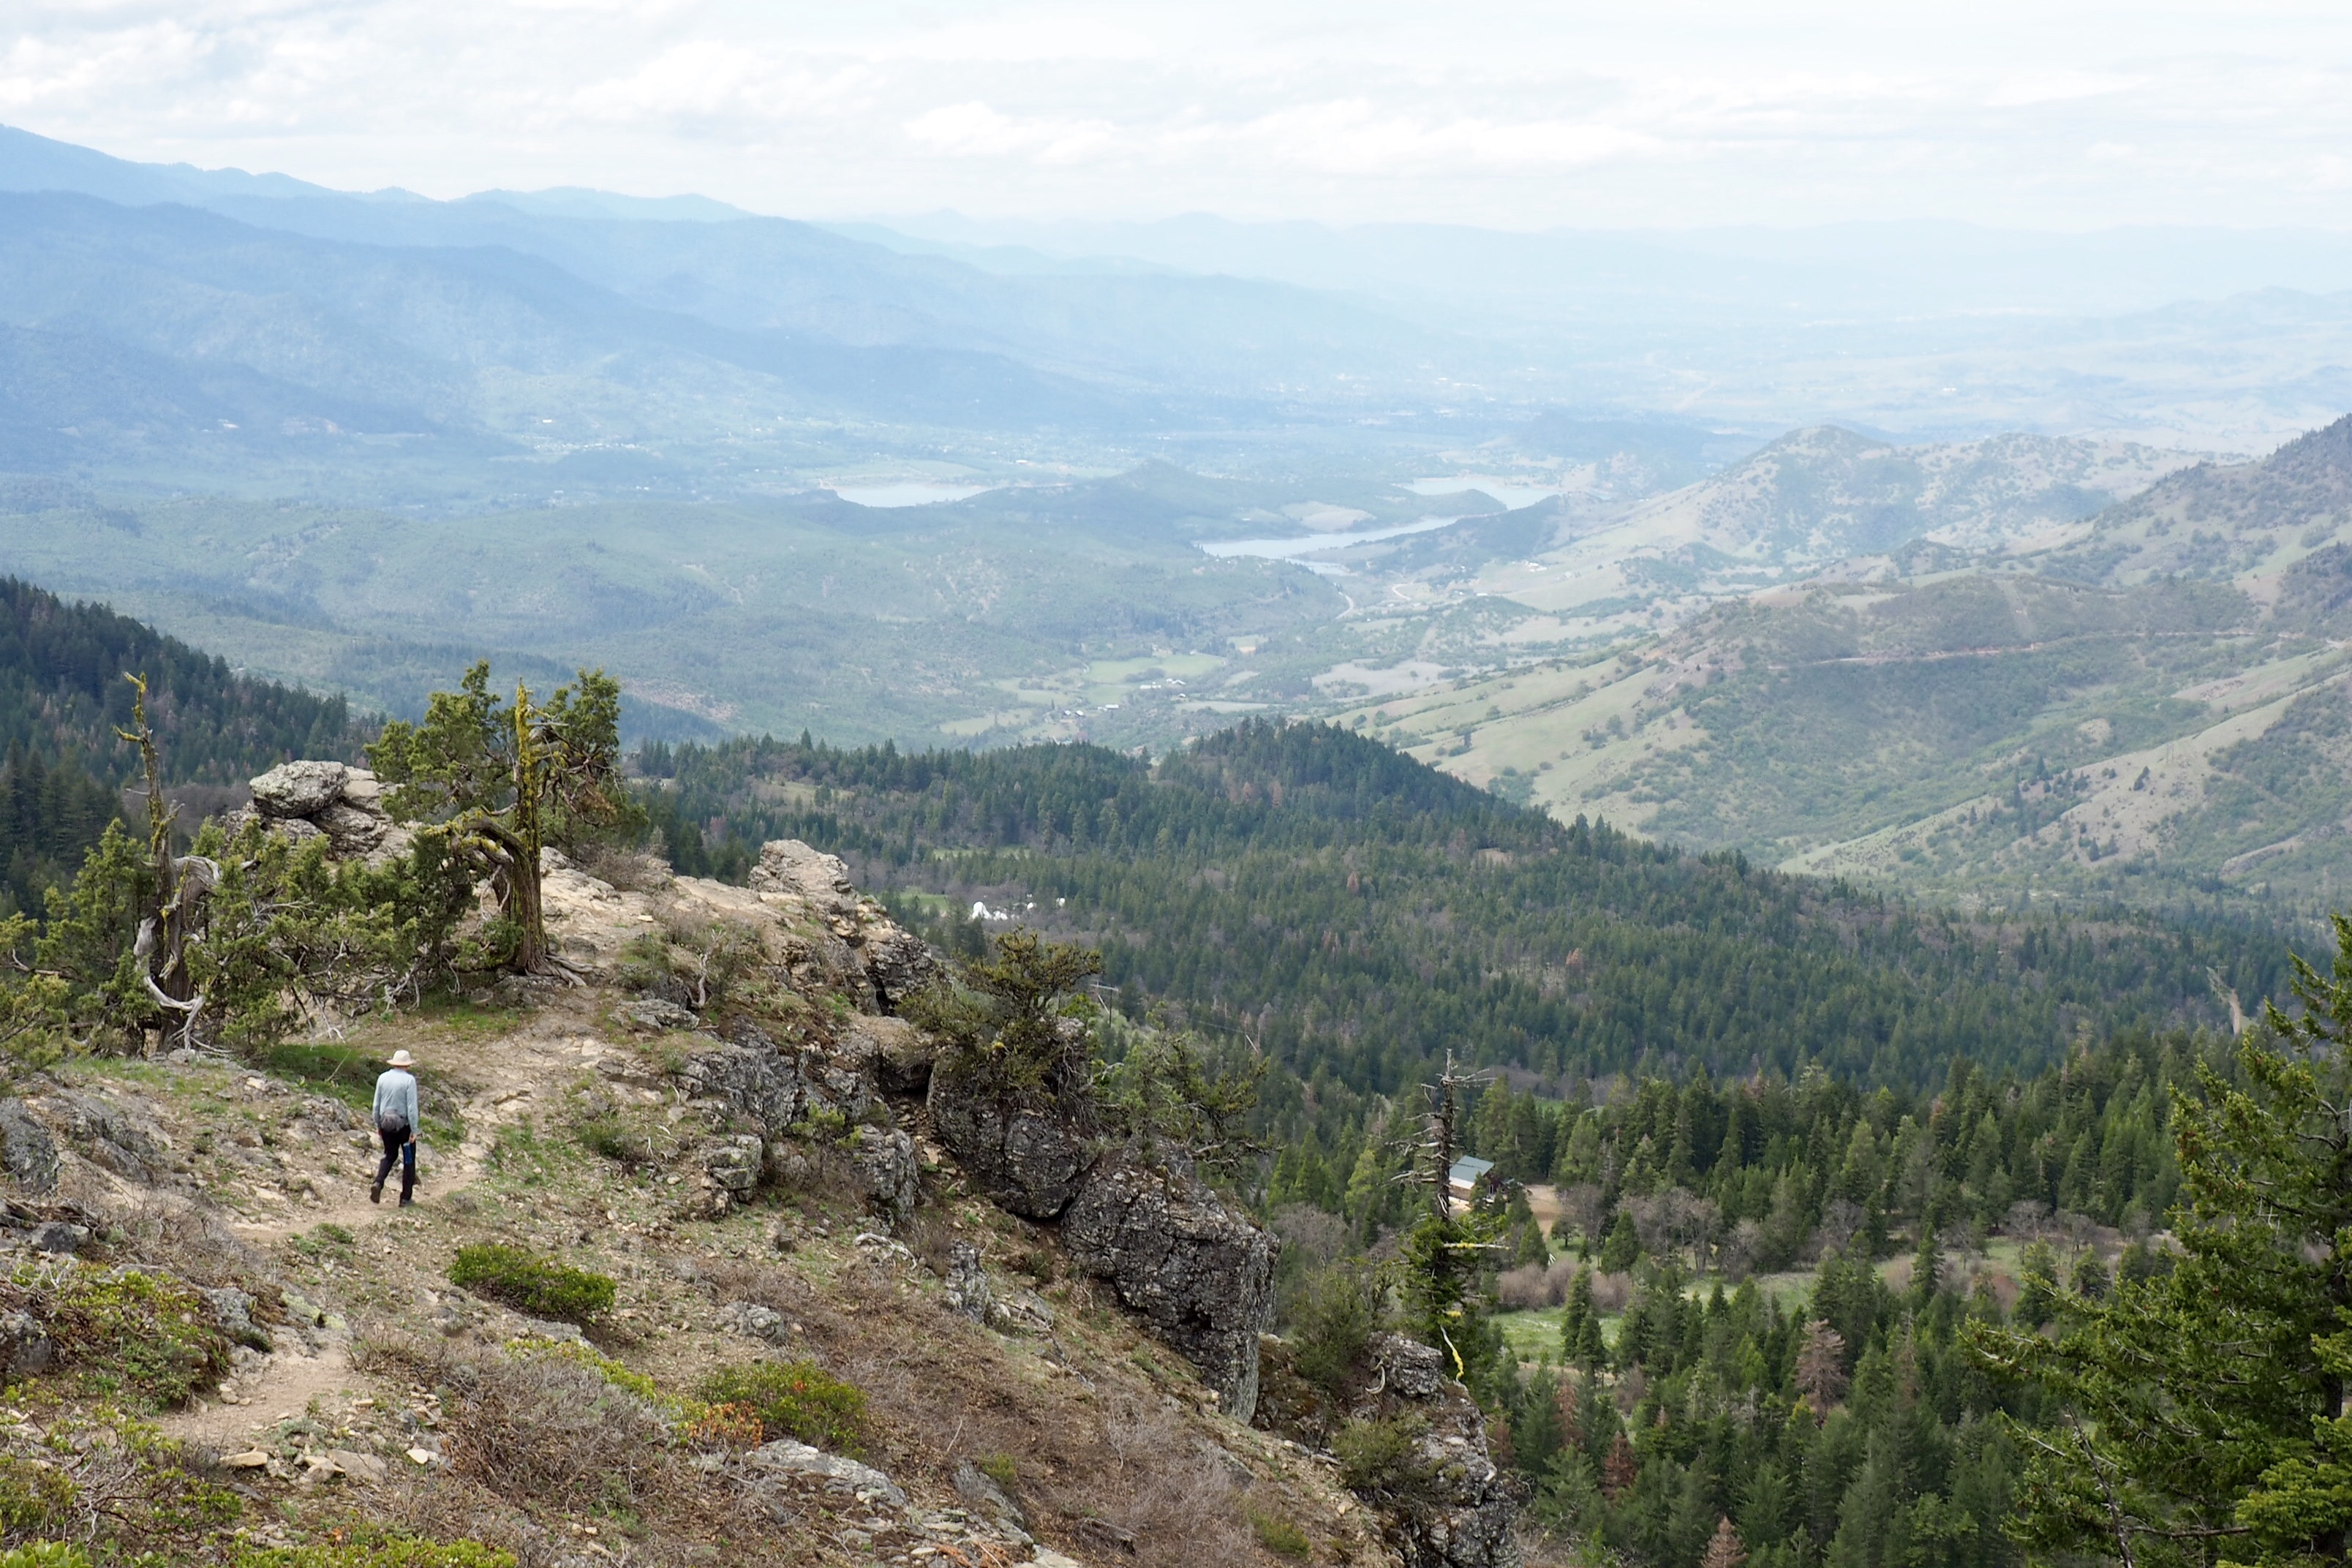 Hobart Bluff Viewpoint